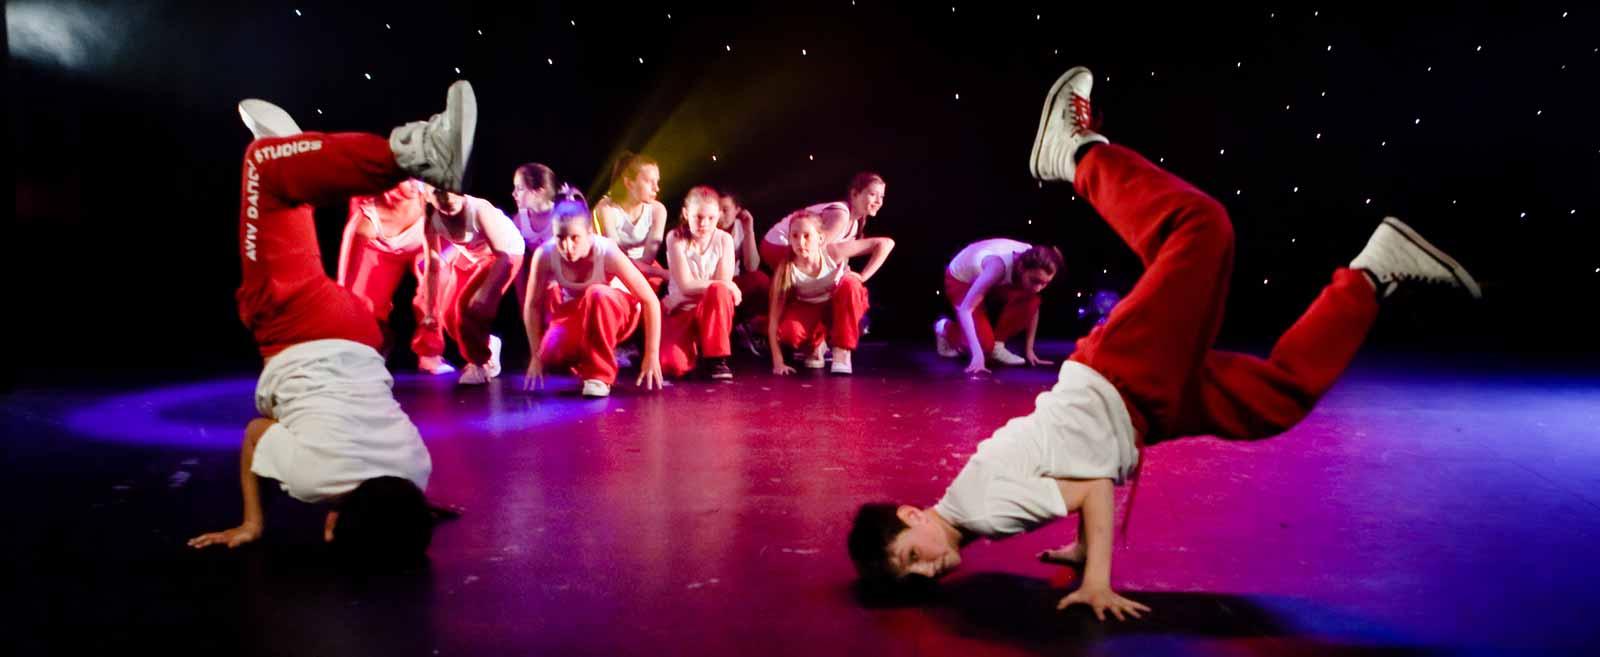 A hip hop dance performance at the Aviv Dance Studios' annual show